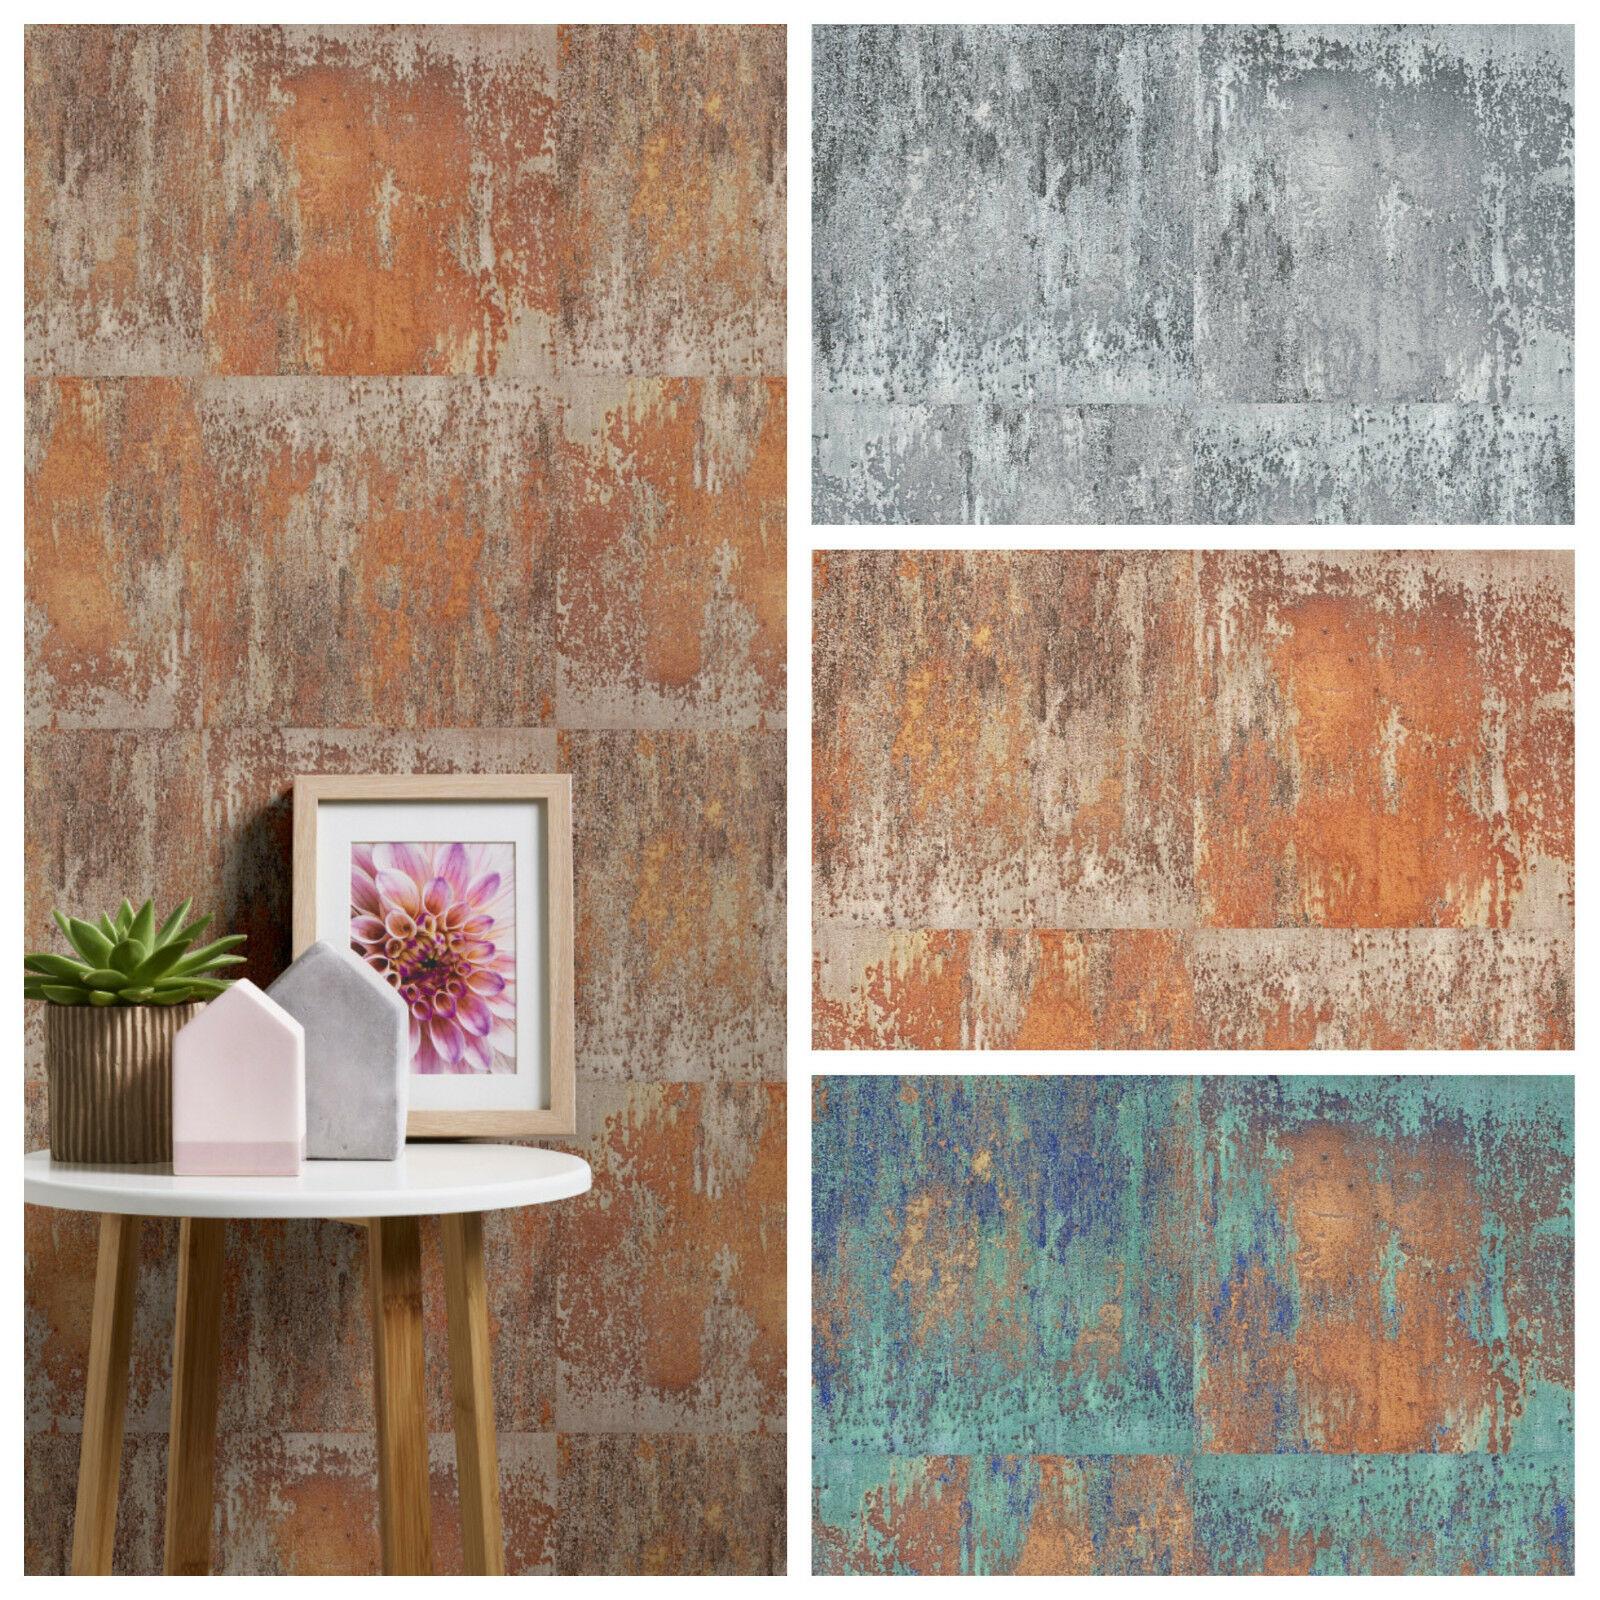 vliestapete metall stein beton optik terra rost patina petrol t rkis grau kaufen bei joratrend. Black Bedroom Furniture Sets. Home Design Ideas